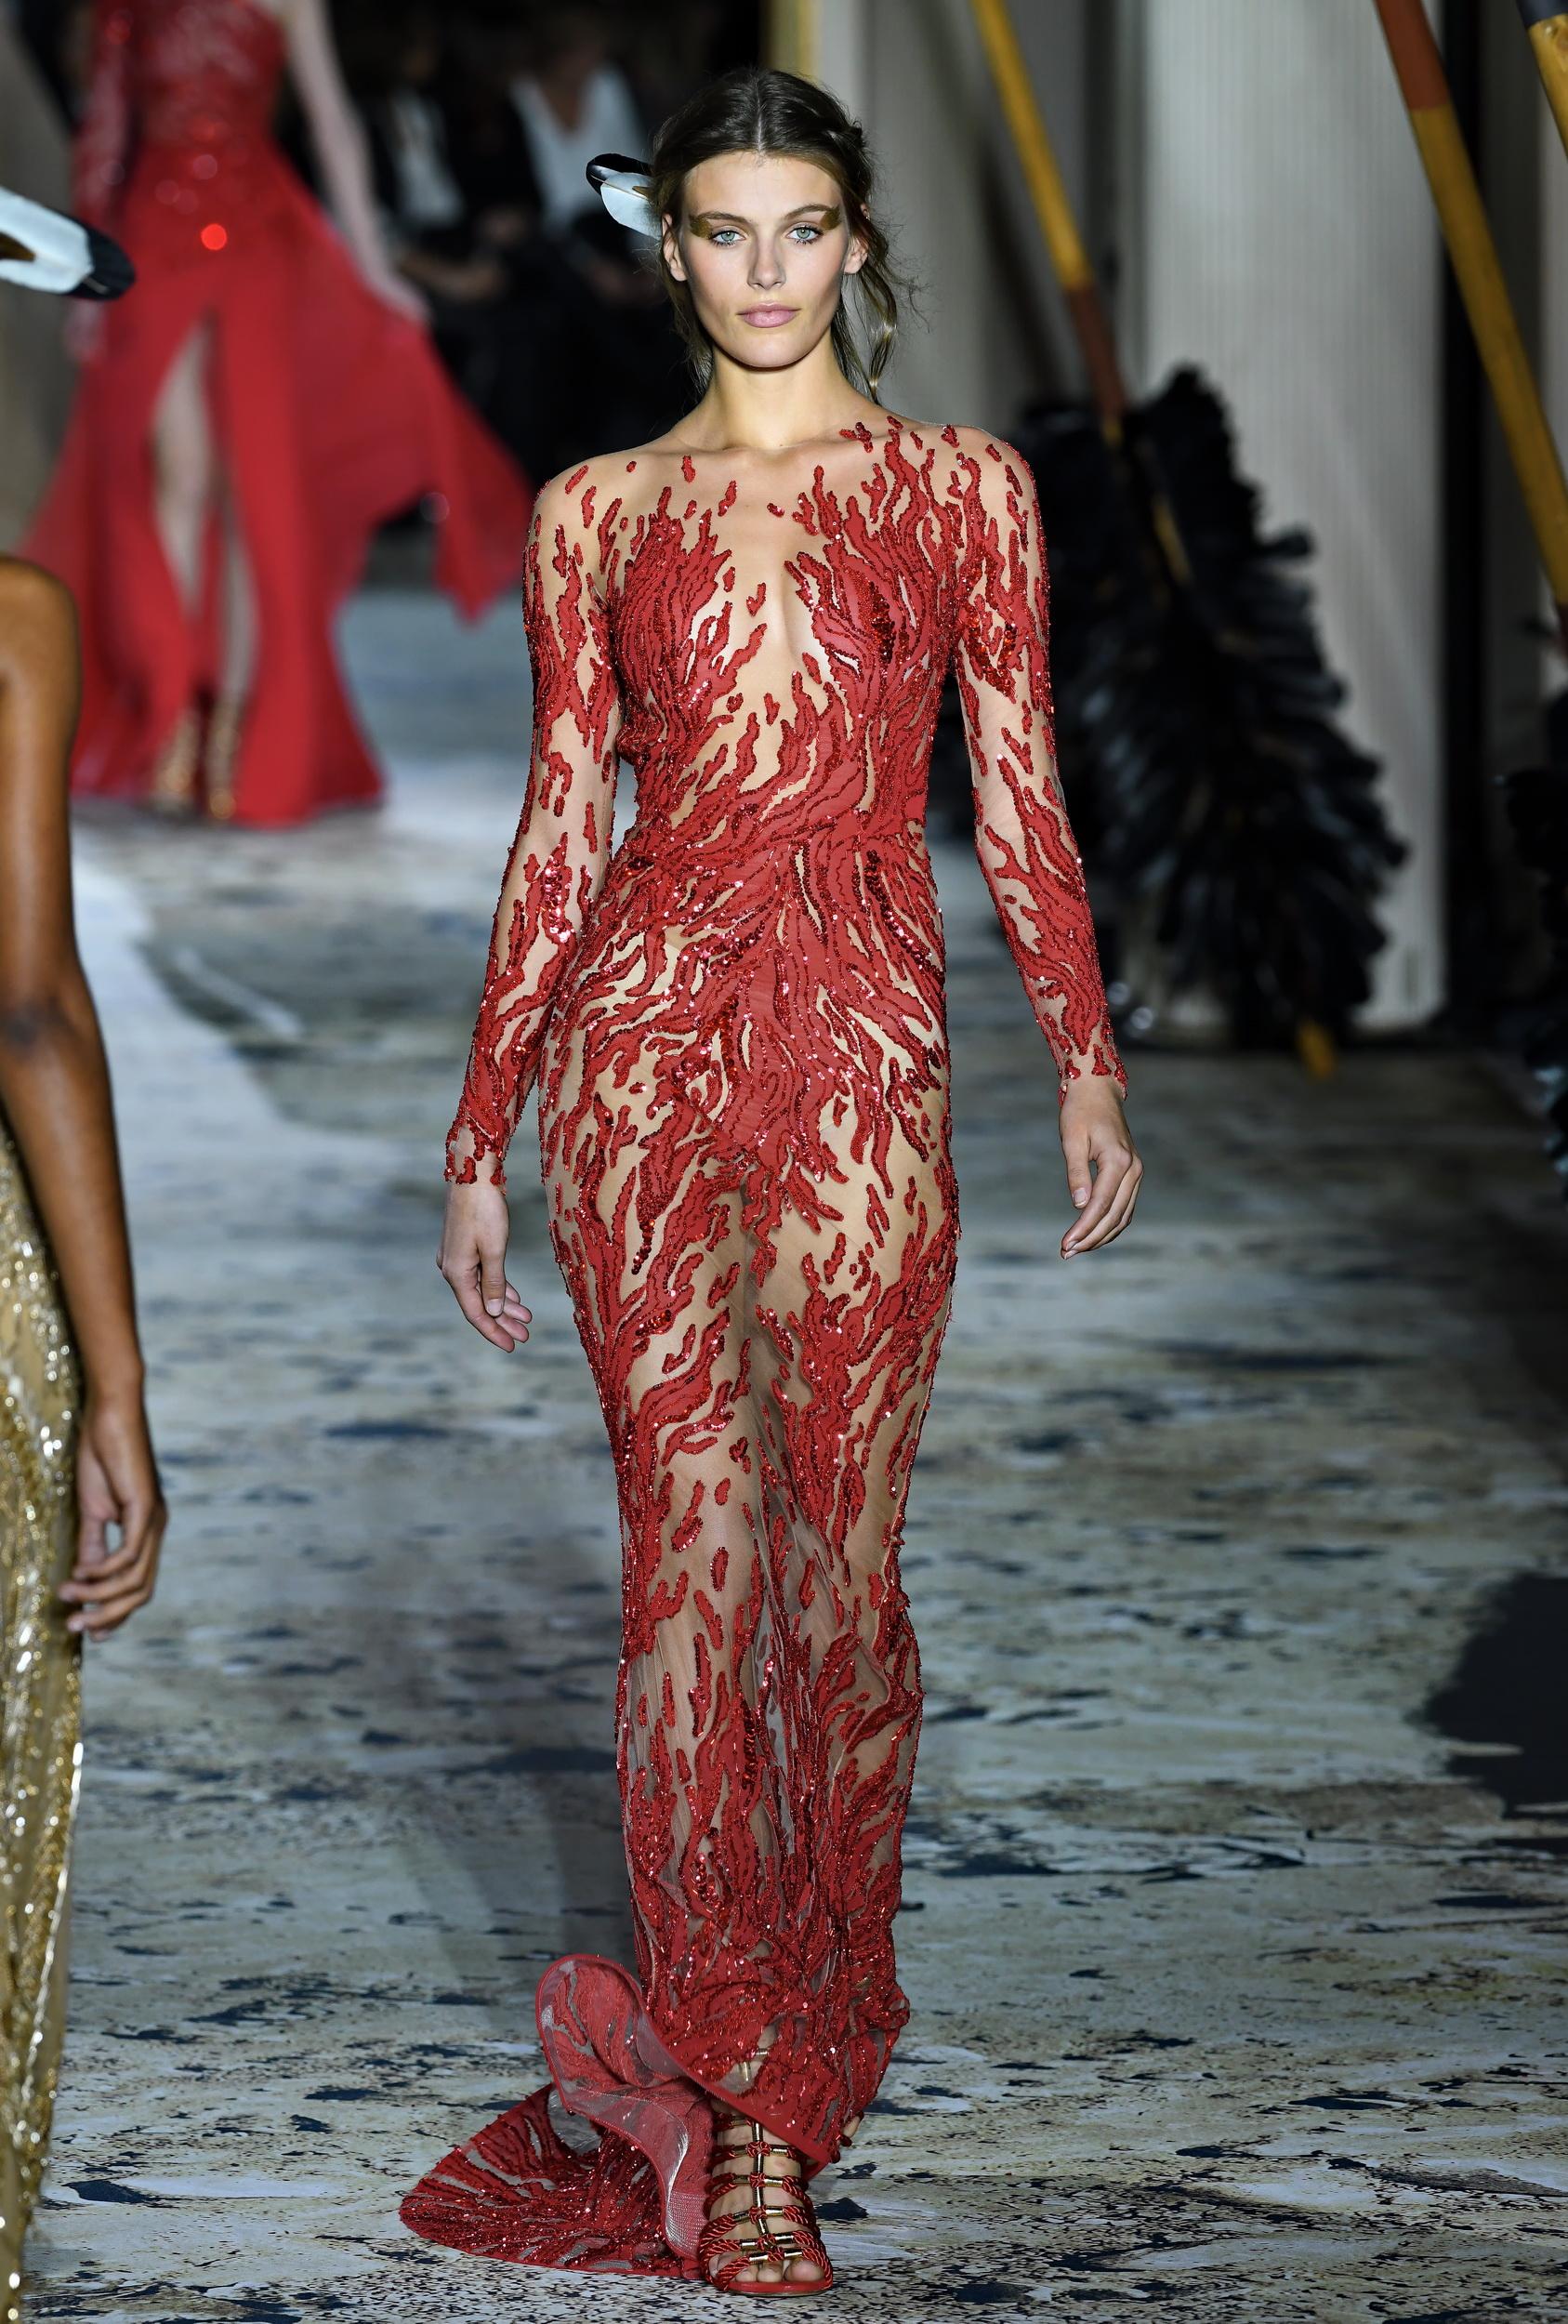 Paris Haute Couture SS 2018 Zuhair Murad 4to4u Arthur Koff 10.JPG